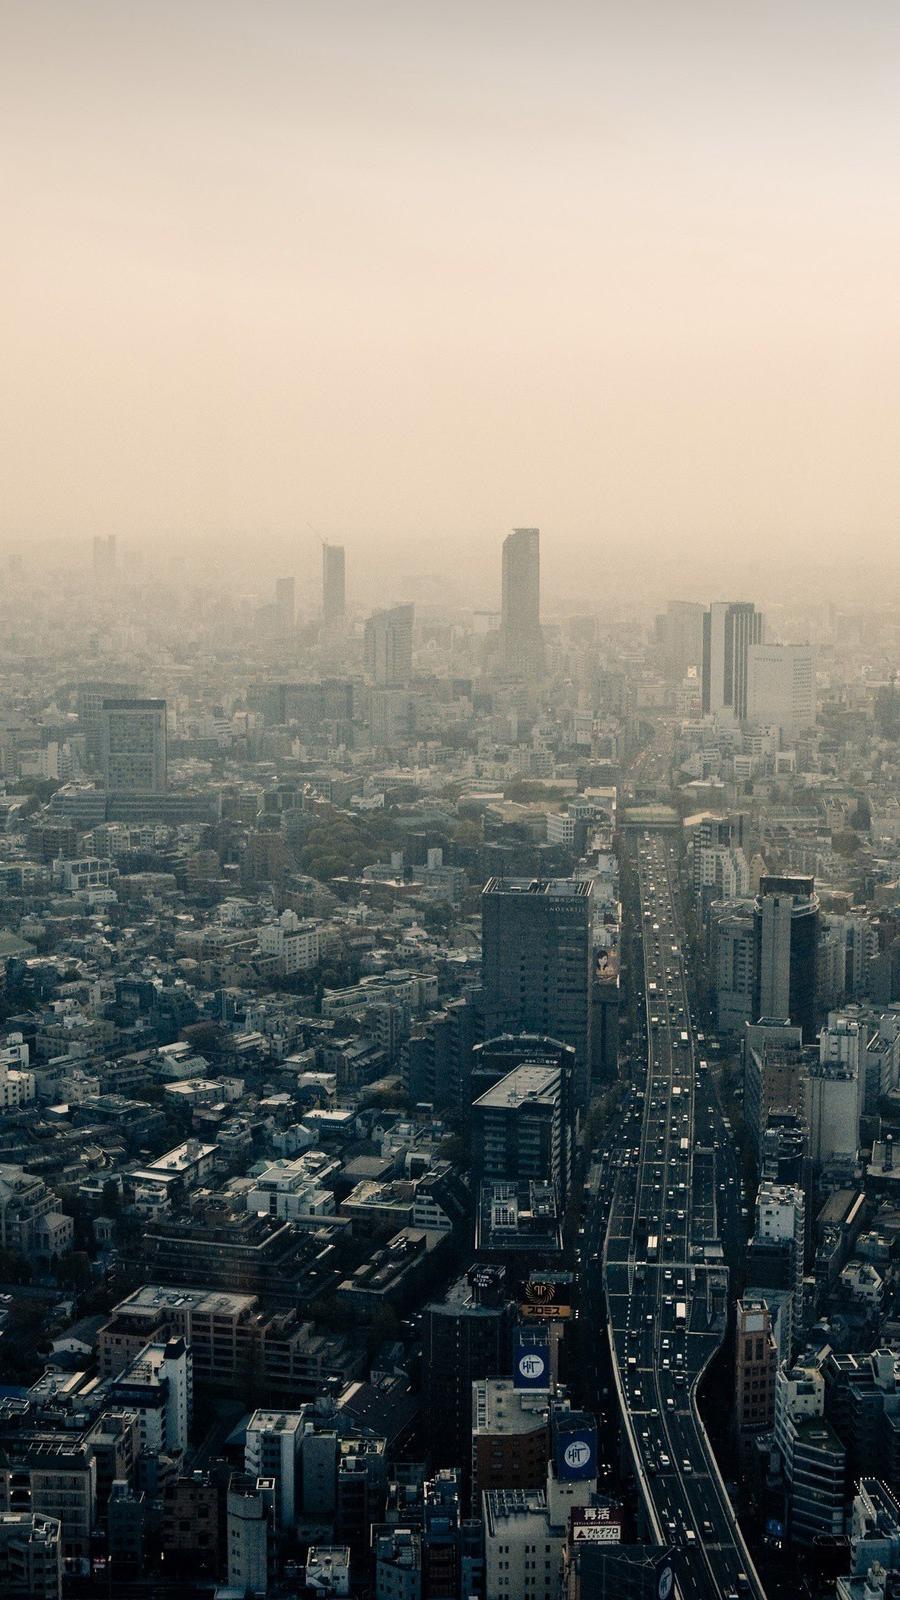 The-Dark-City-of-Japan-Wallpaper-iPhone-Wallpaper - iPhone